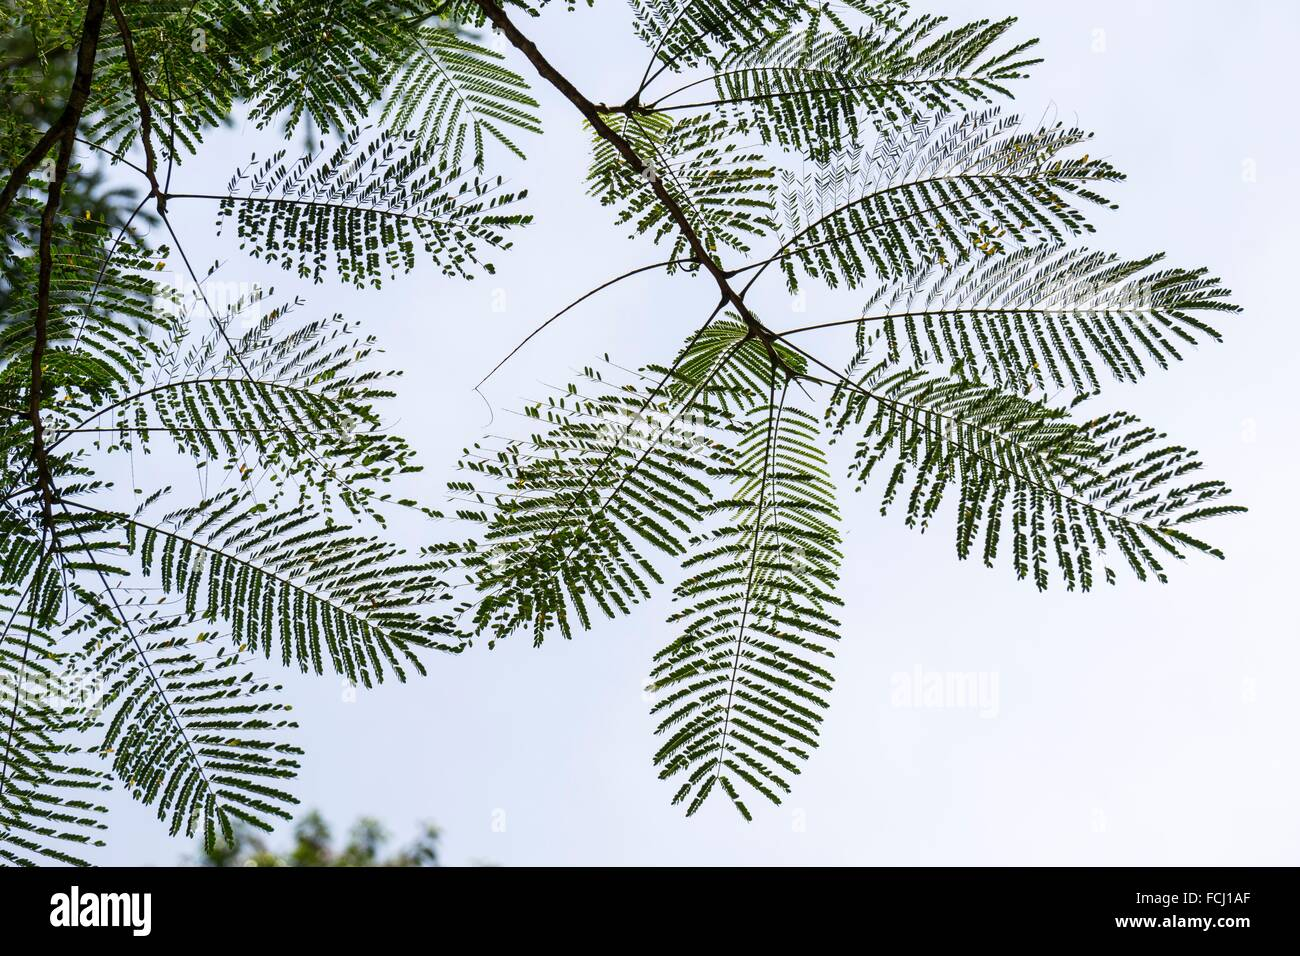 Shooting backlit hairy leaves at Semengoh Wildlife Centre, Kuching, Sarawak, Malaysia. - Stock Image